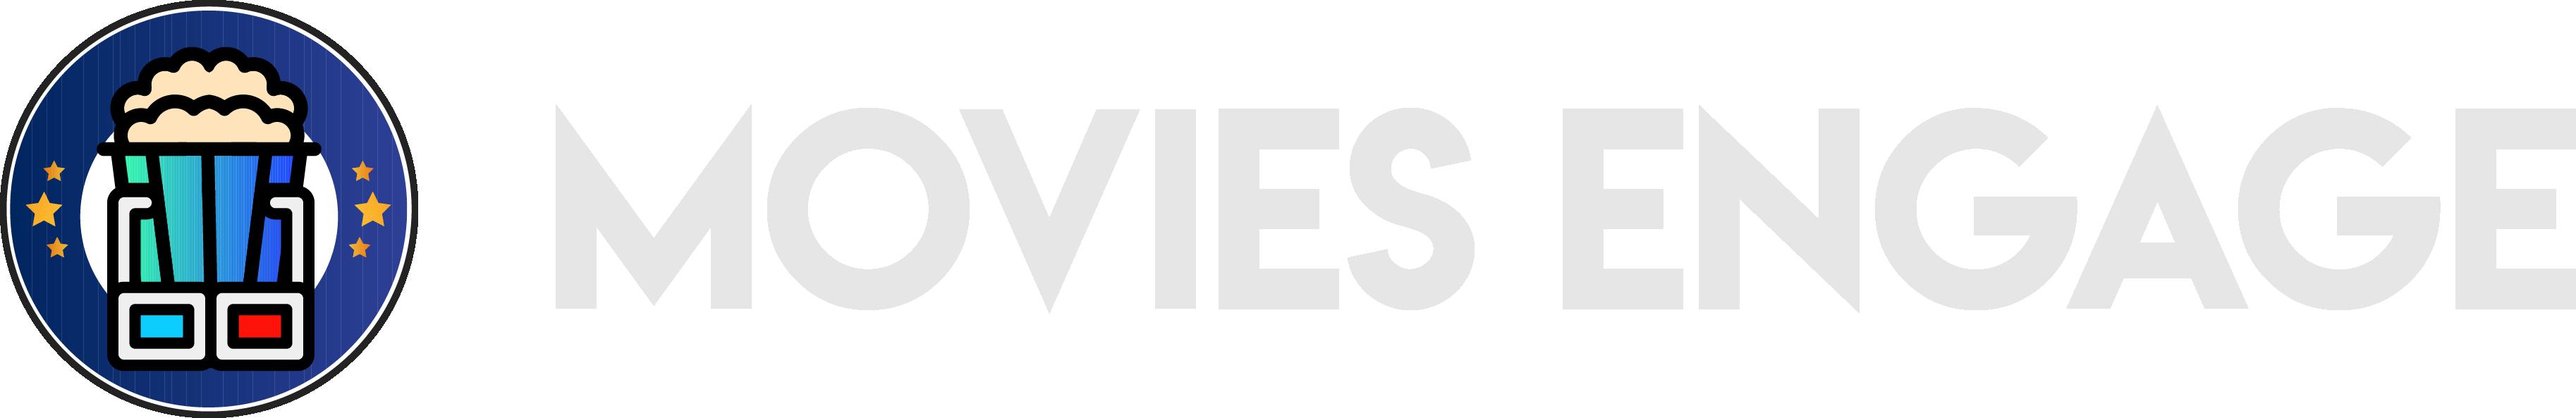 MoviesEngage Logo